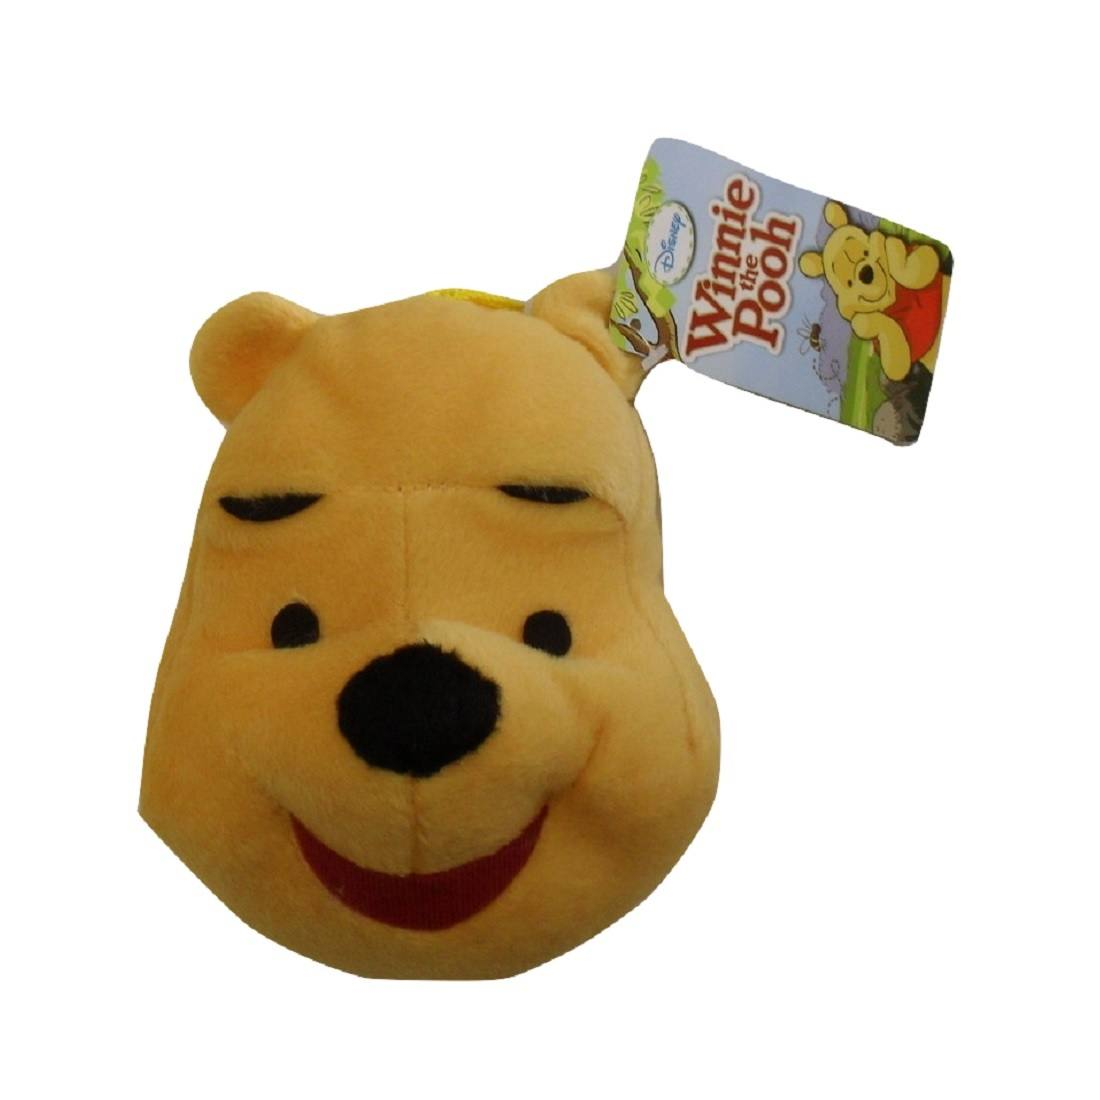 Copripiumino Singolo Winnie The Pooh.Peluche Disney Winnie The Pooh Faccia Originale By Caleffi